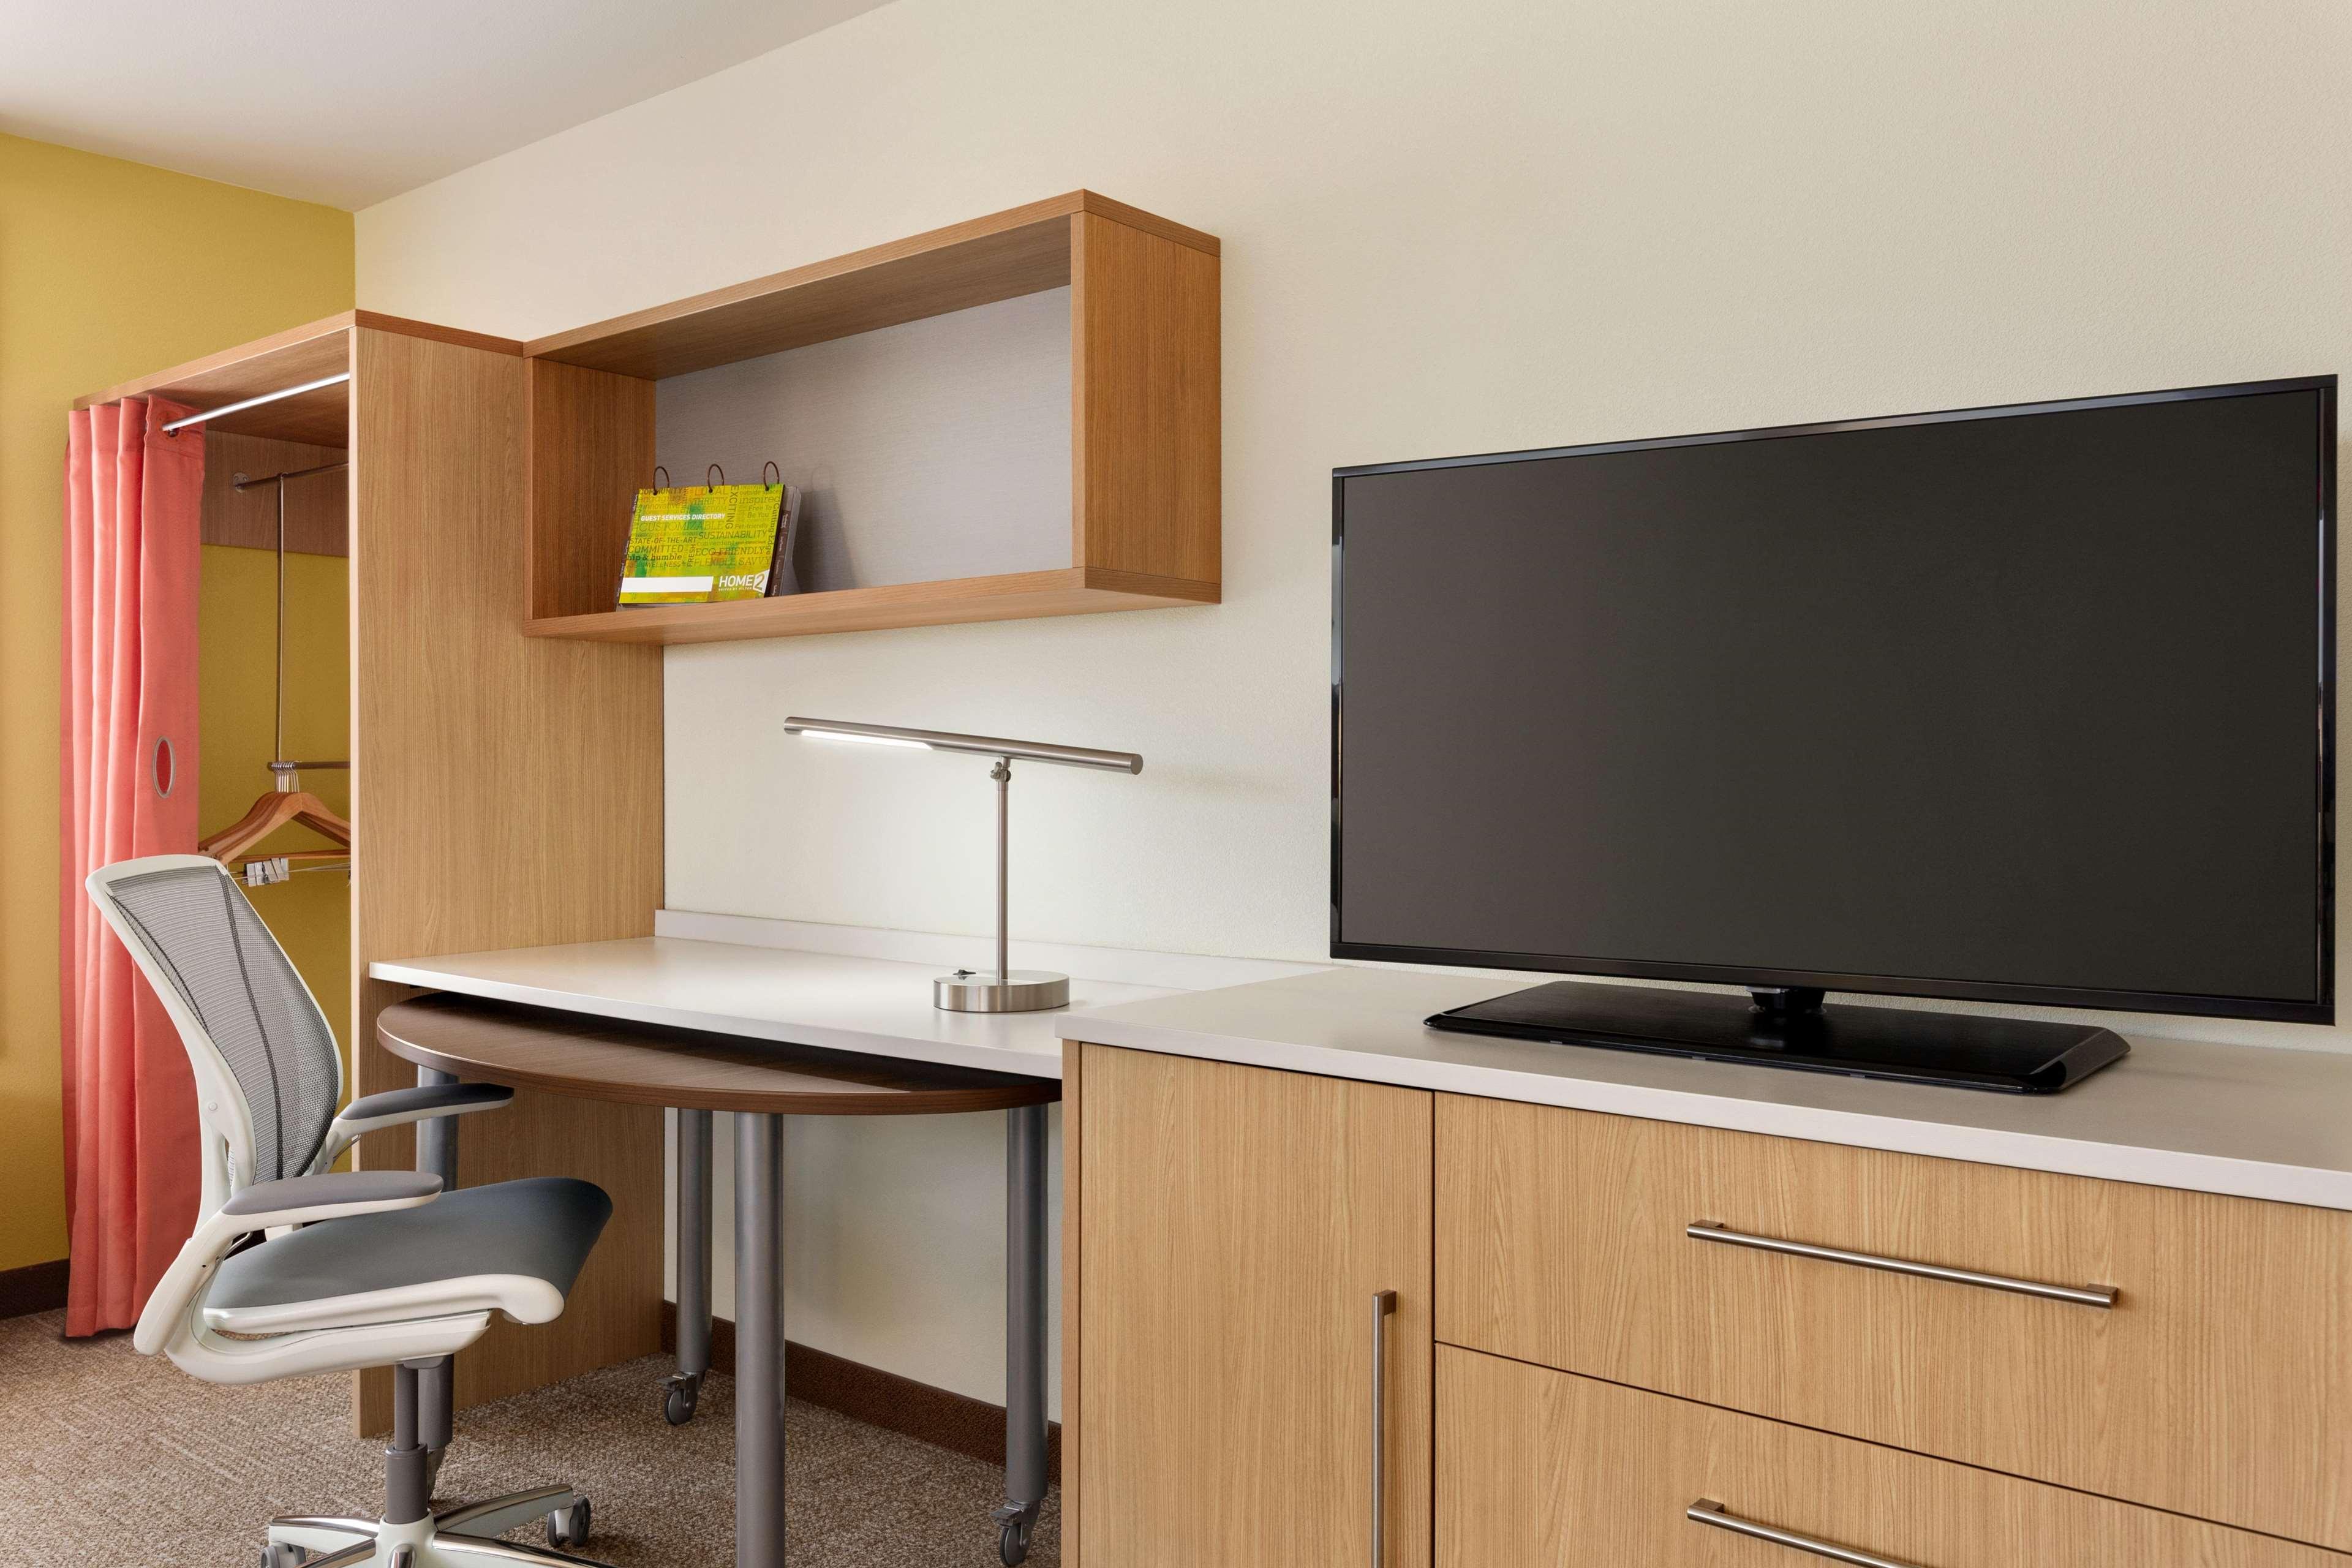 Home2 Suites by Hilton Waco image 3